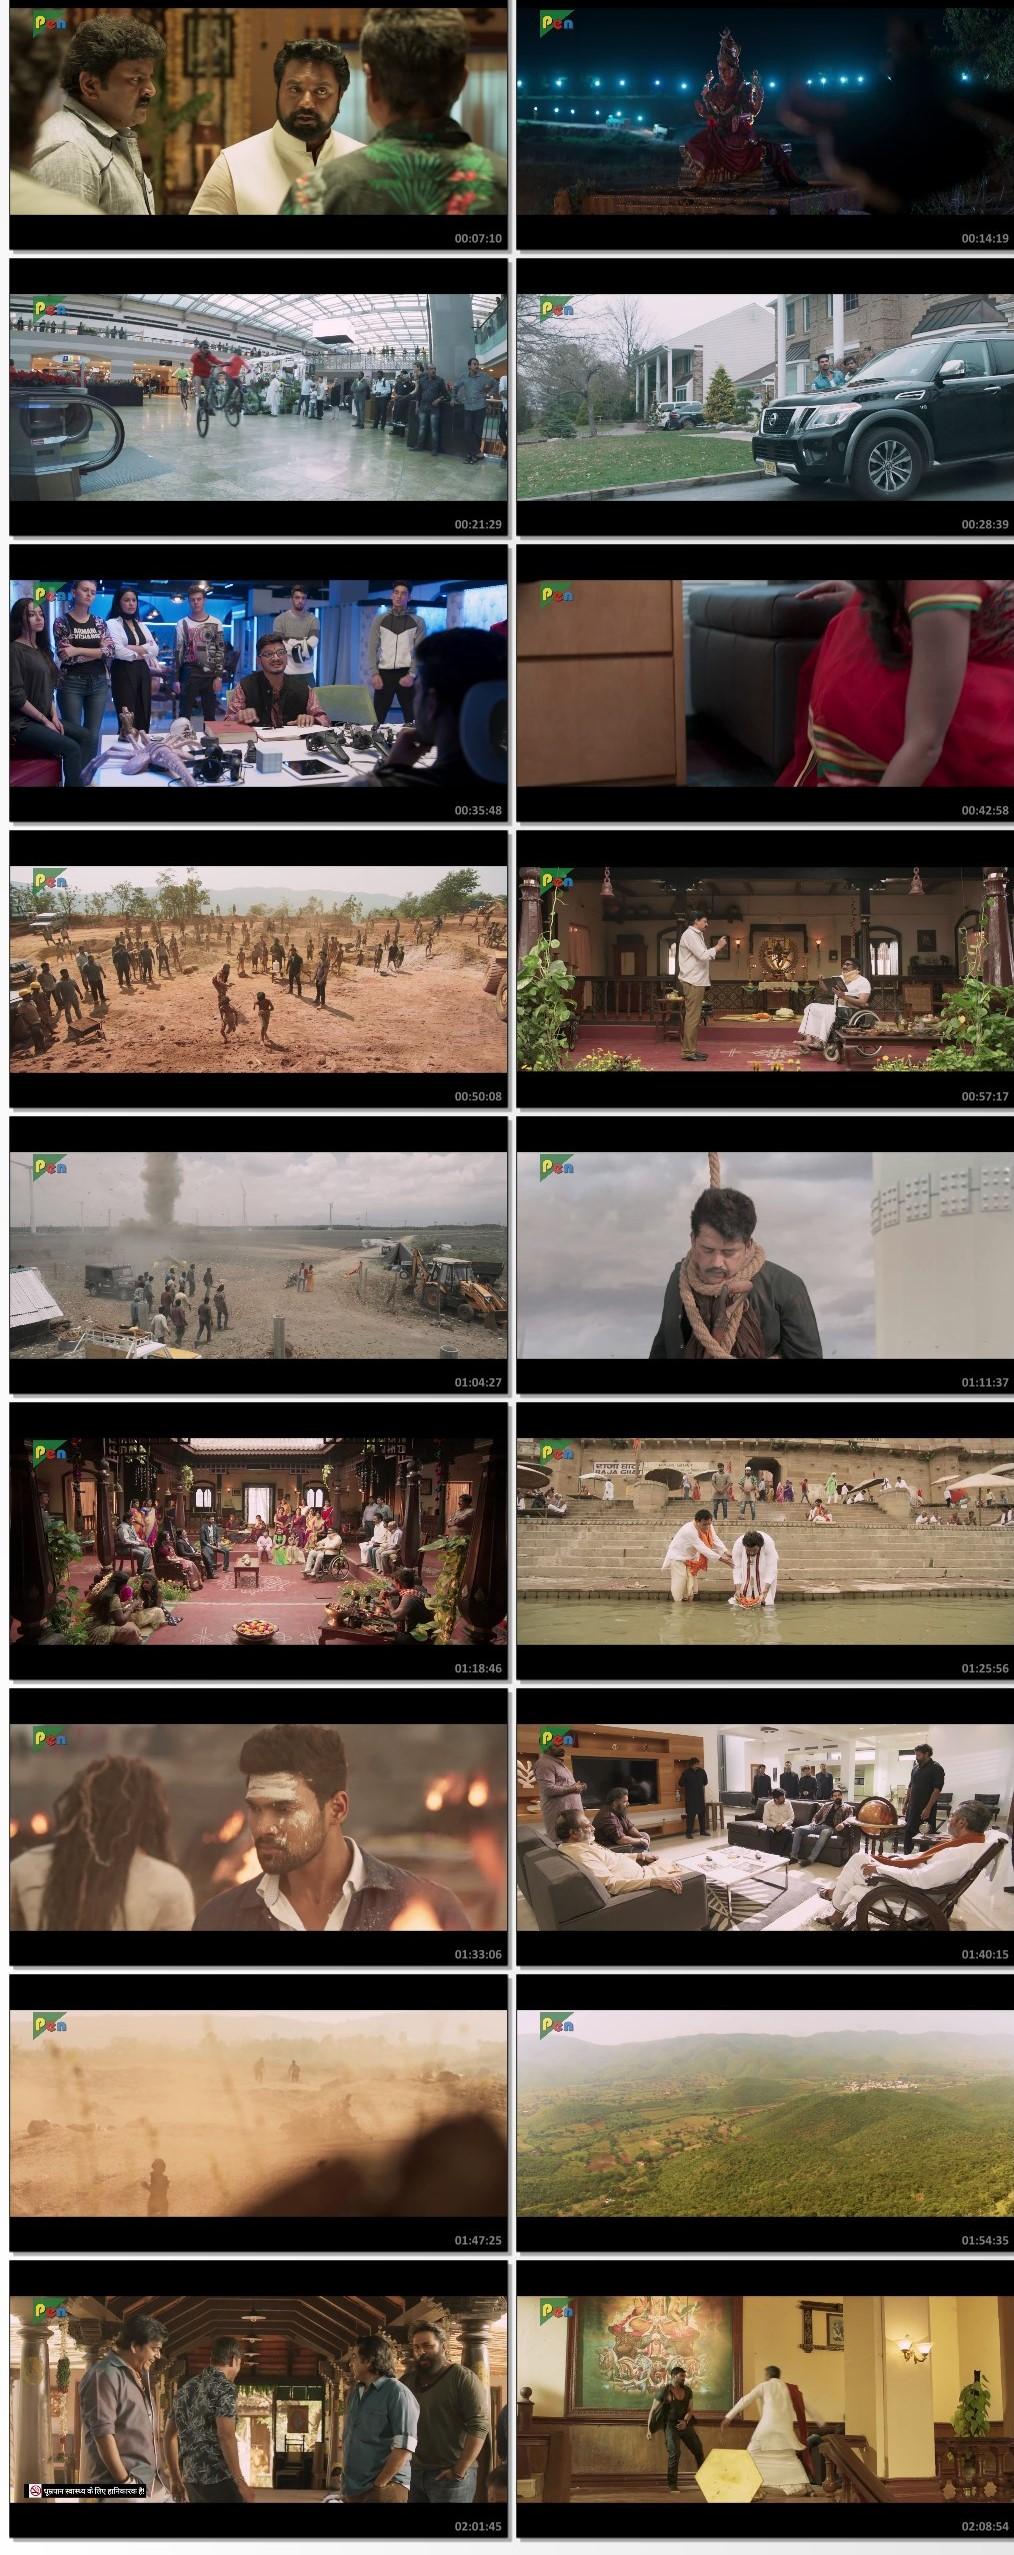 Pralay-The-Destroyer-Saakshyam-2021-Hindi-Dubbed-1080p-HDRip-1-9-GB-www-7-Star-HD-wales-mkv-thumbsad